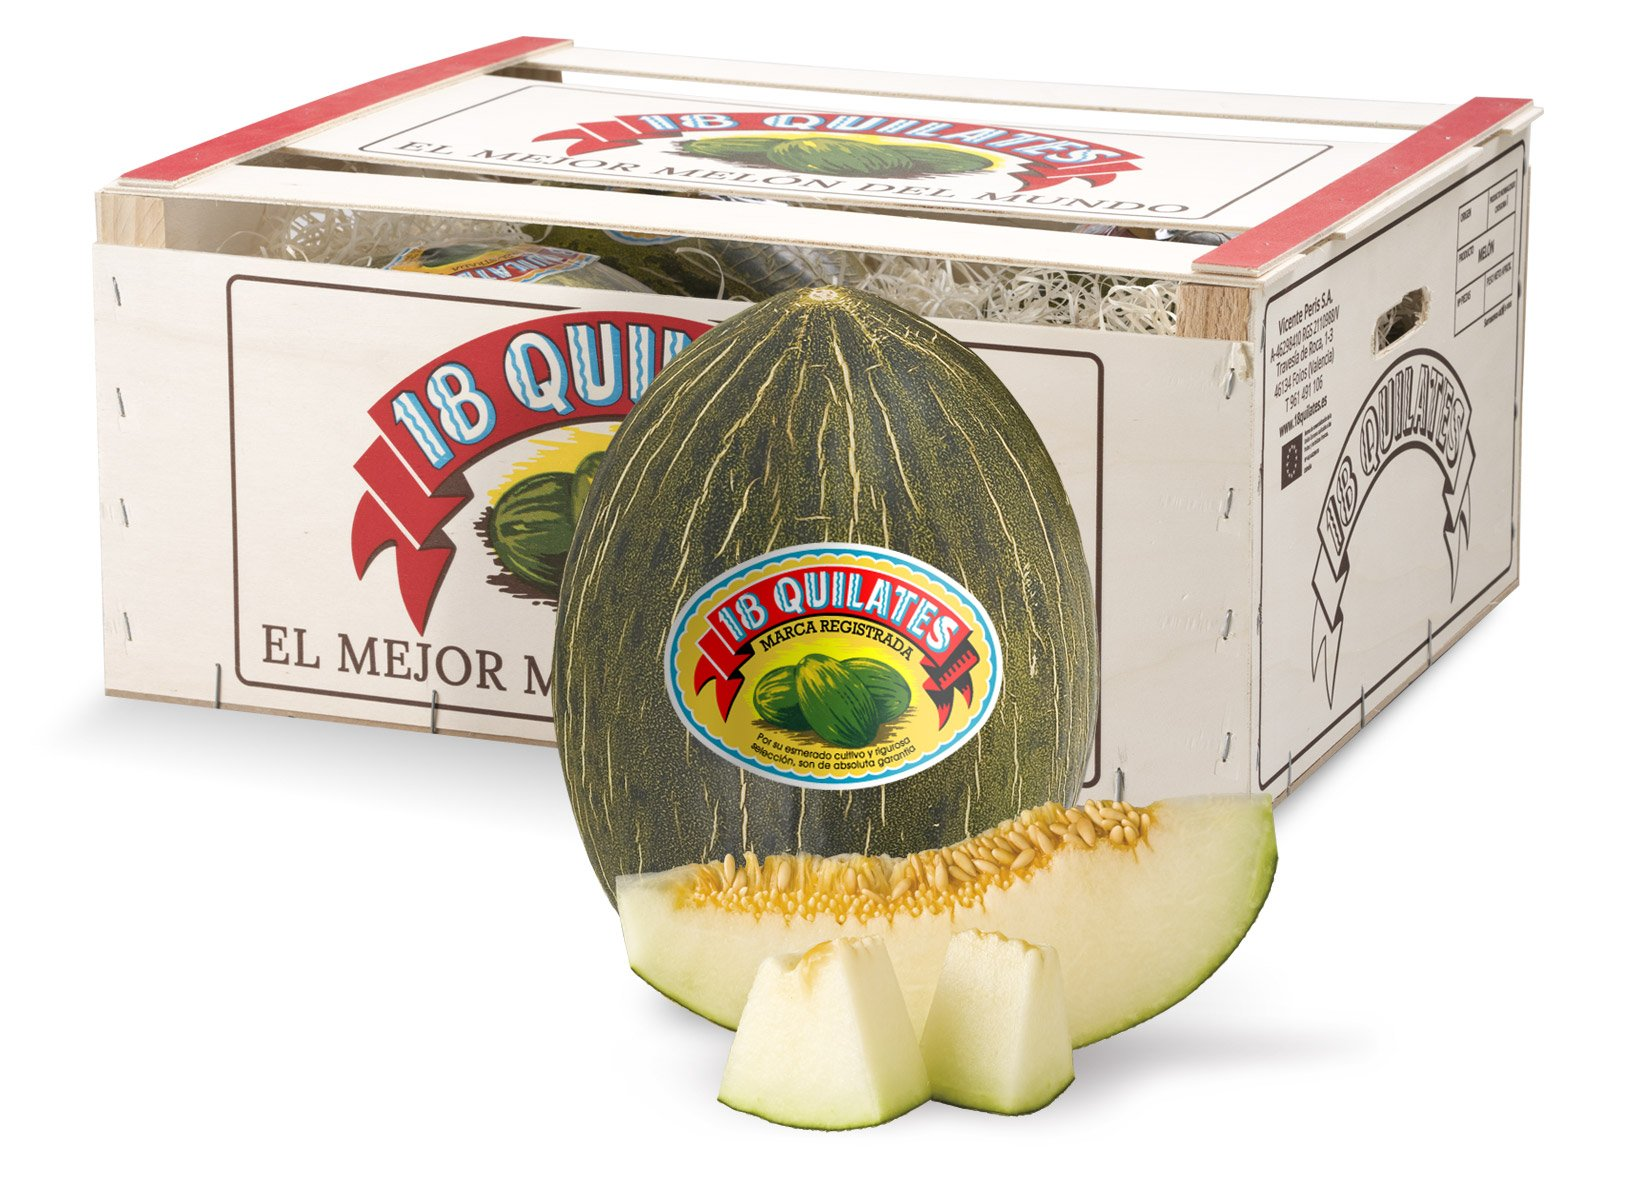 melon18quilates